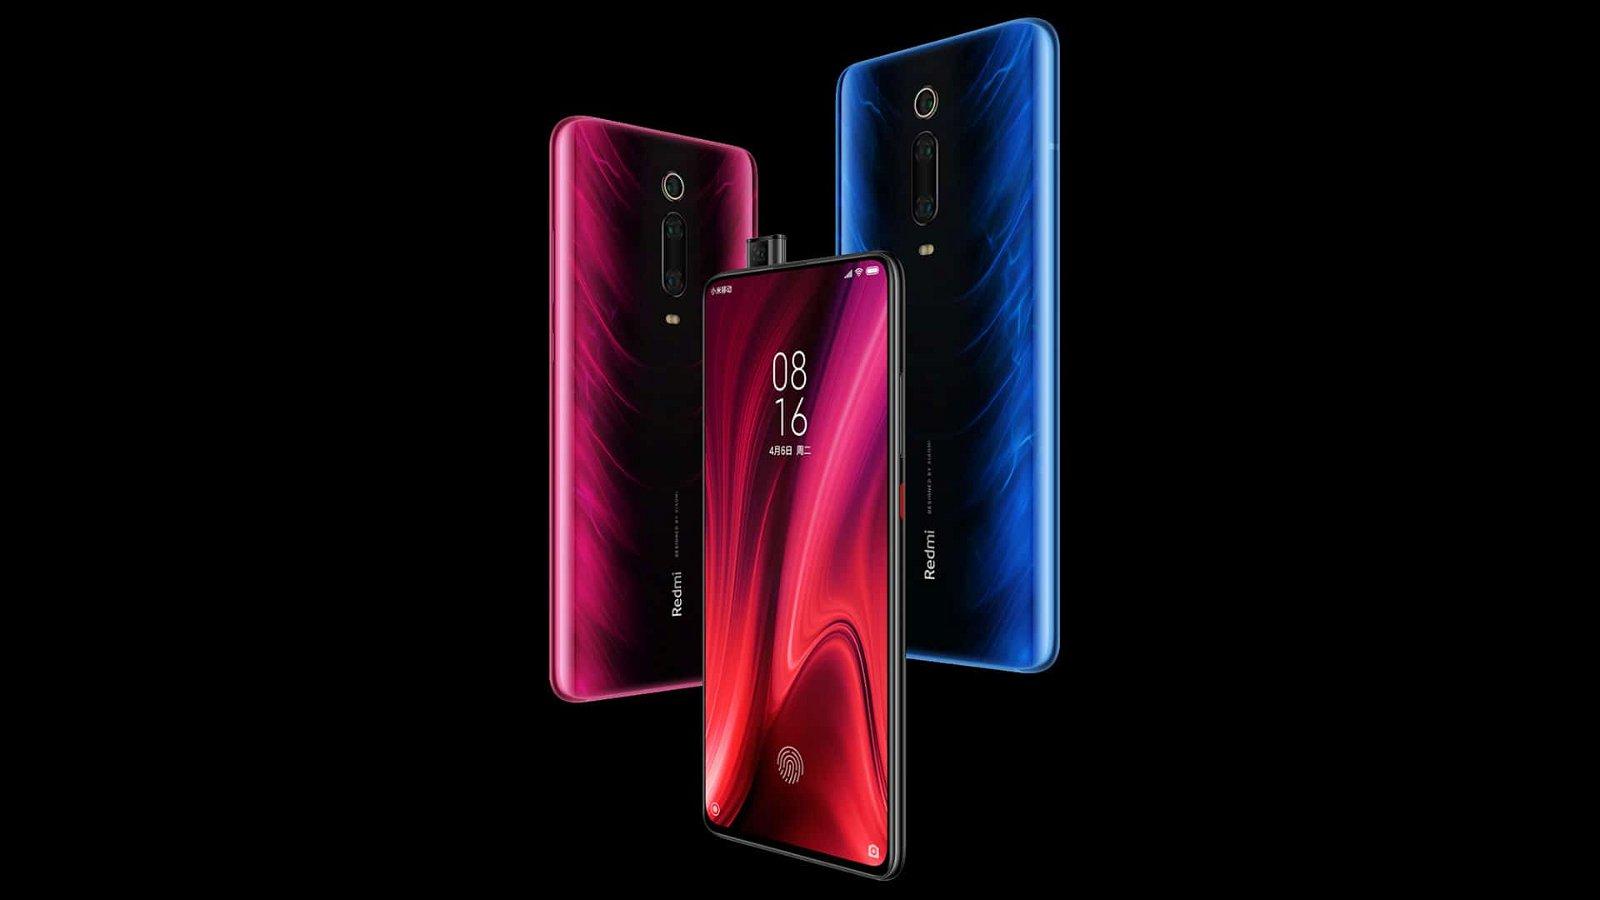 Xiaomi Announces The Xiaomi 7A; K20 and K20 Pro